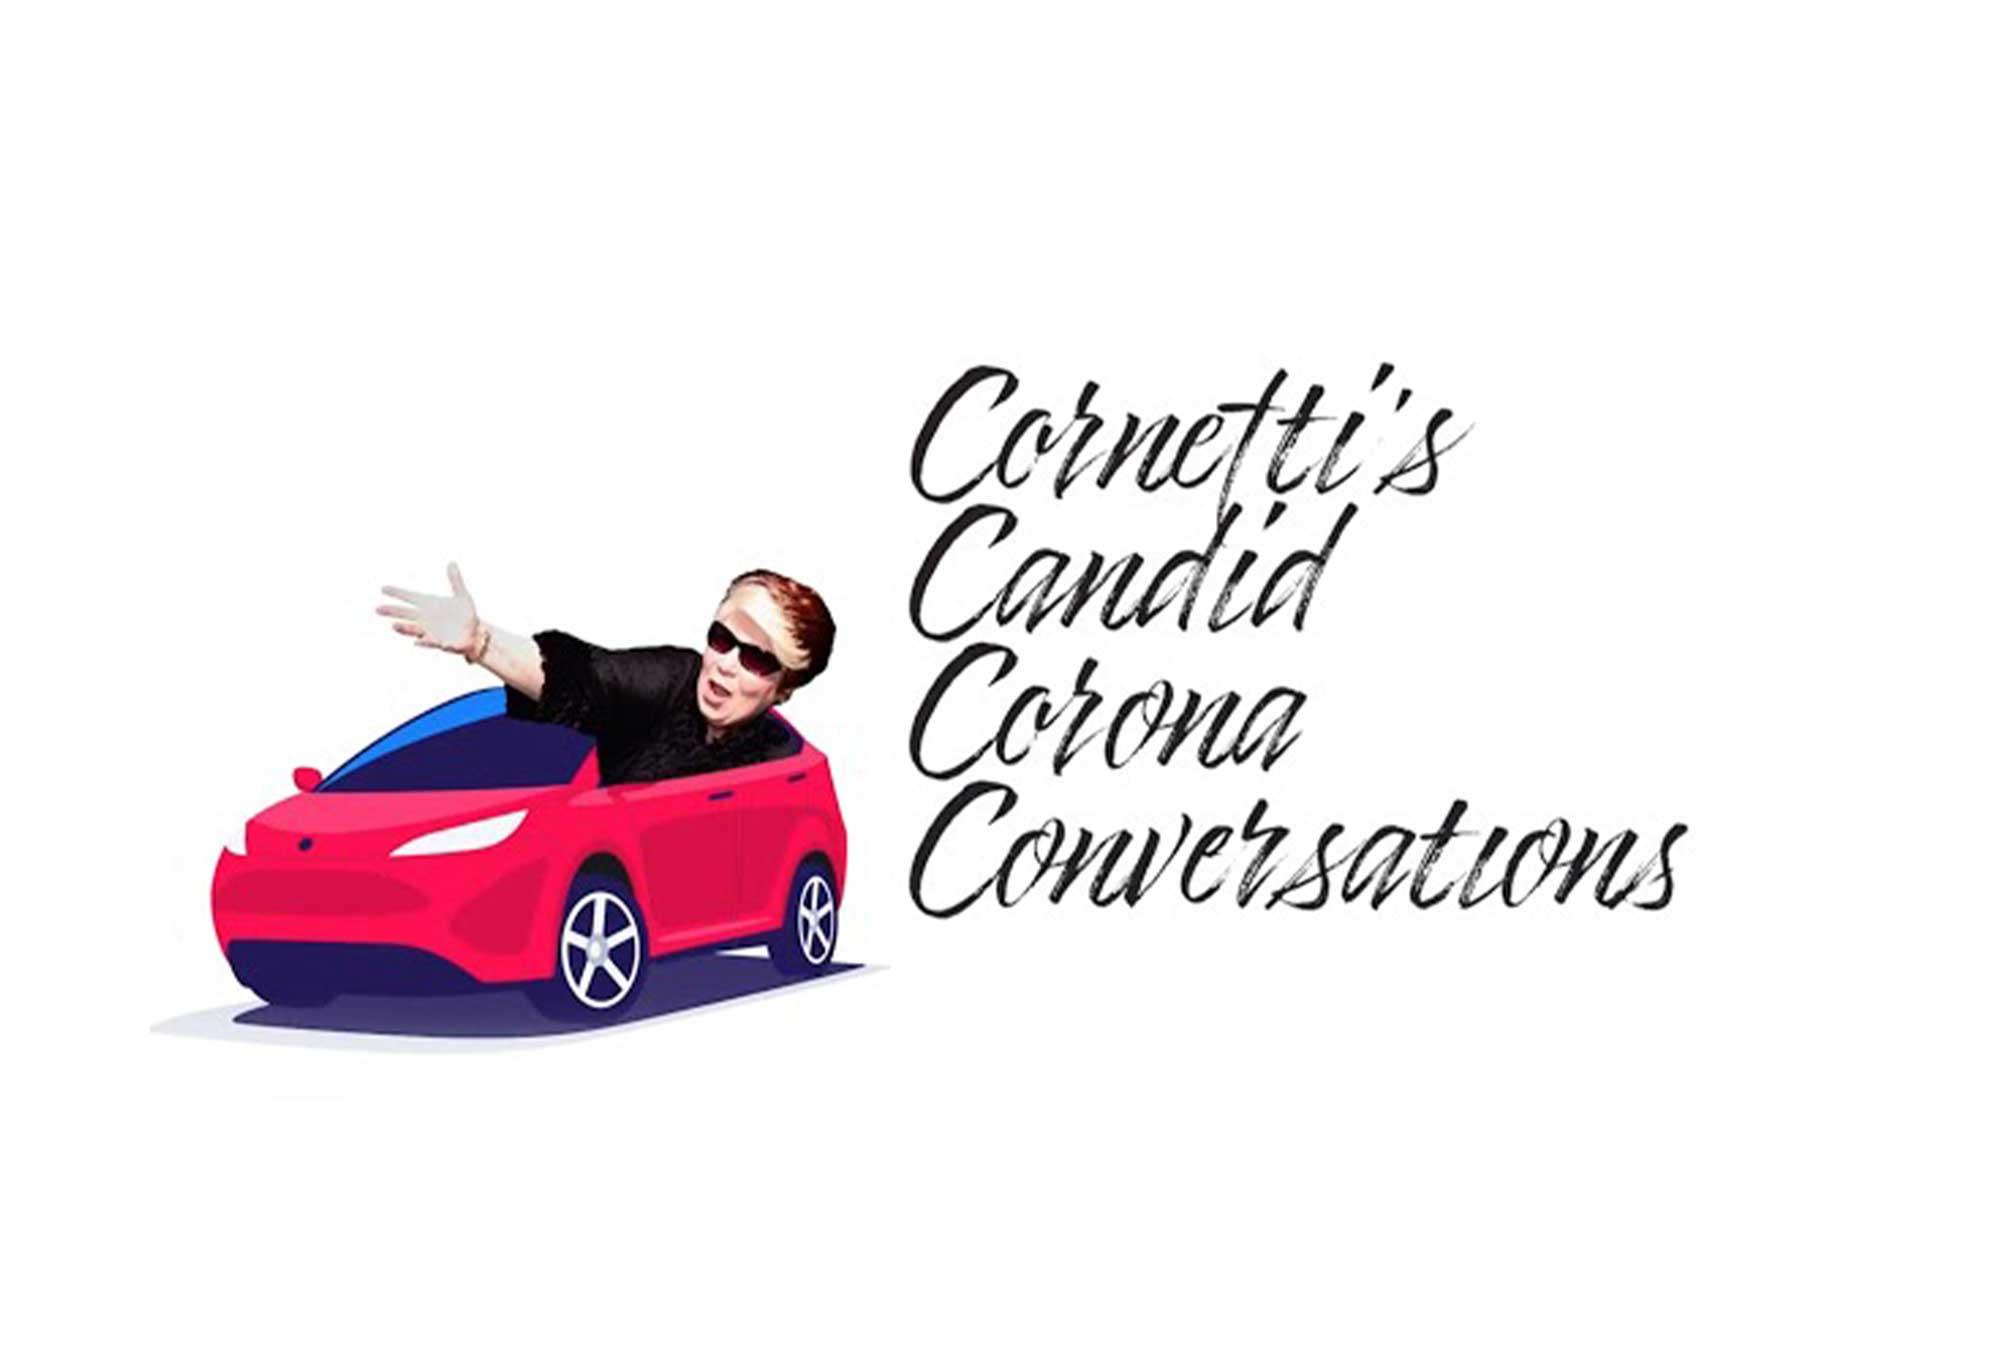 Cornetti's Candid Corona Conversations